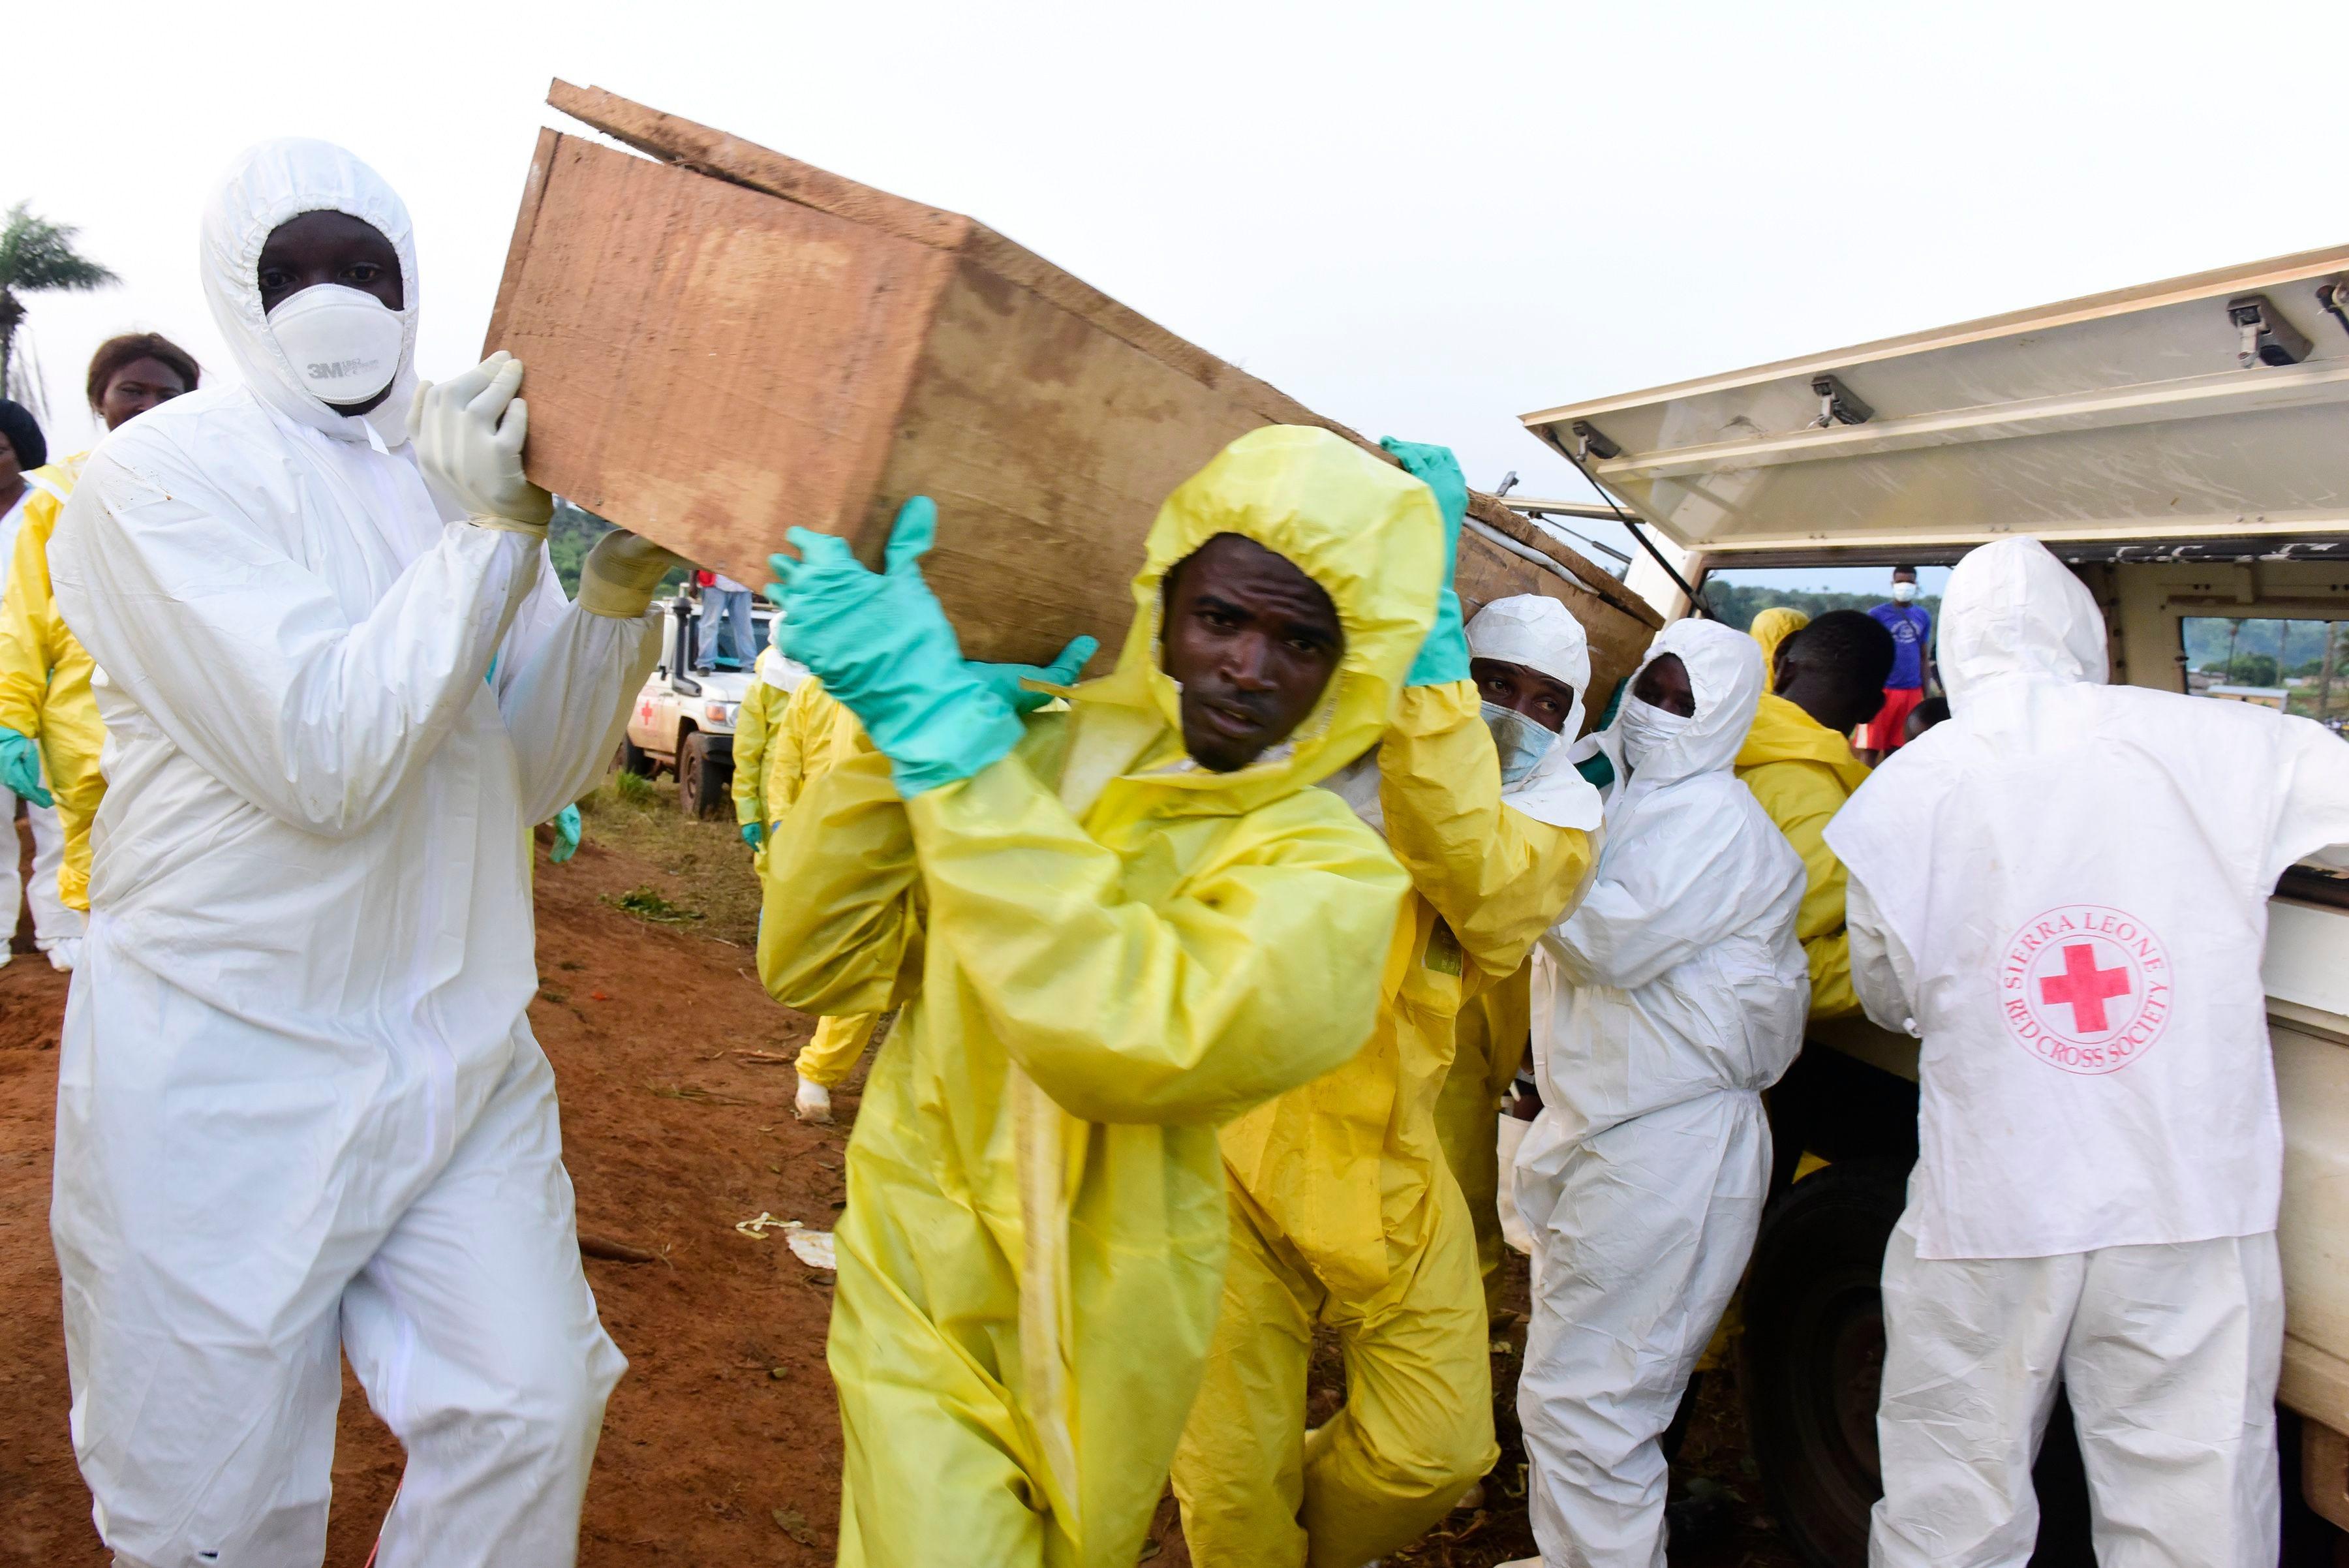 jhoana annotated bibliography ebola